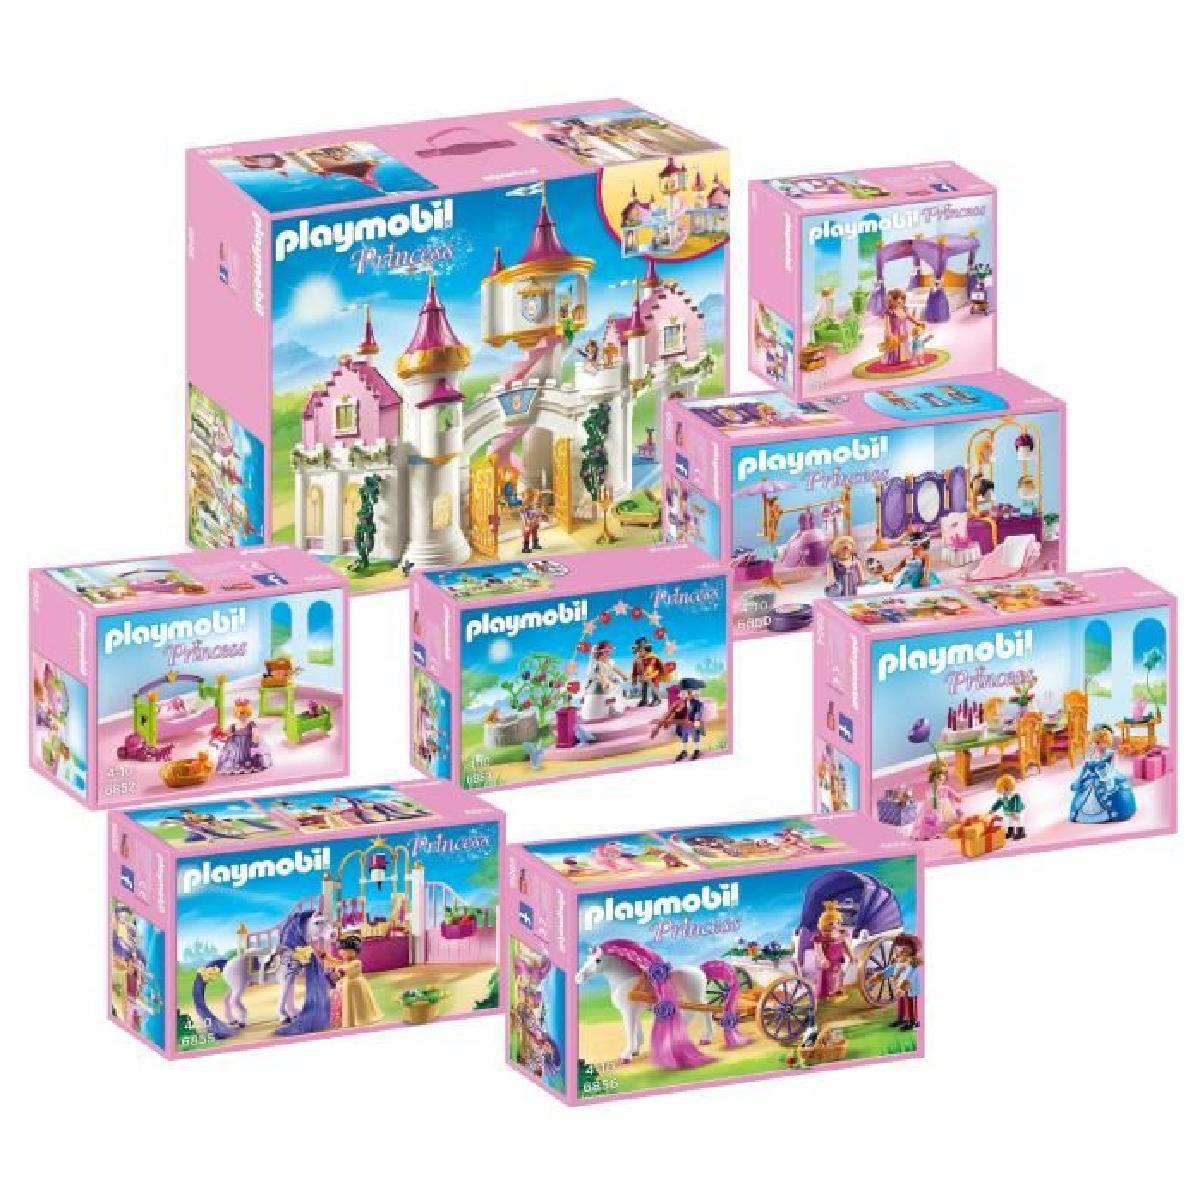 Chateau princesse playmobil complet